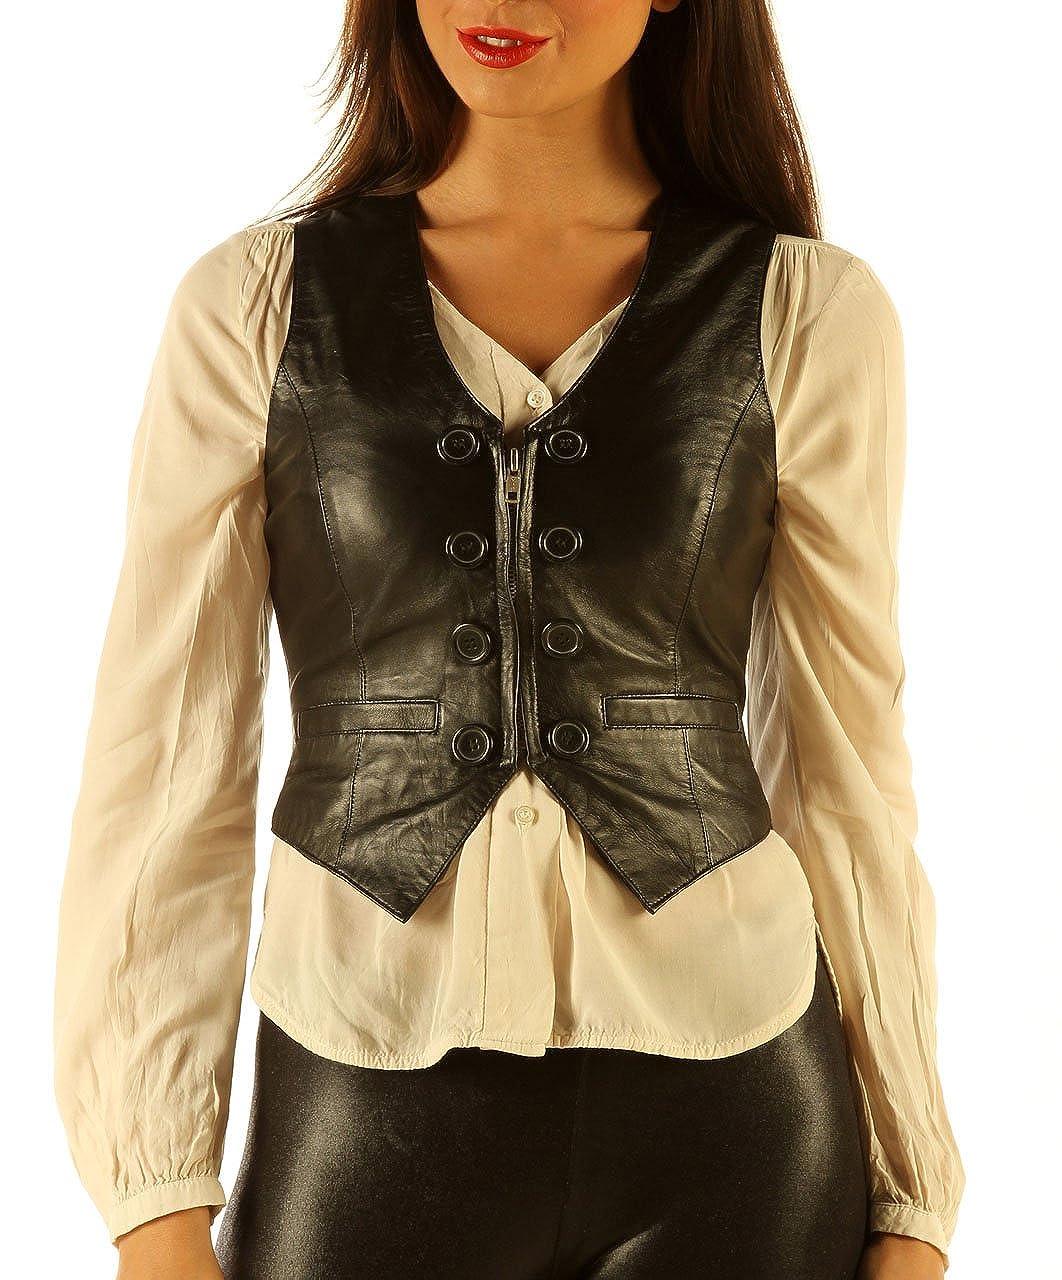 Erocats Soft Leather Short Waist Coat Womens Waistcoat Top wc2